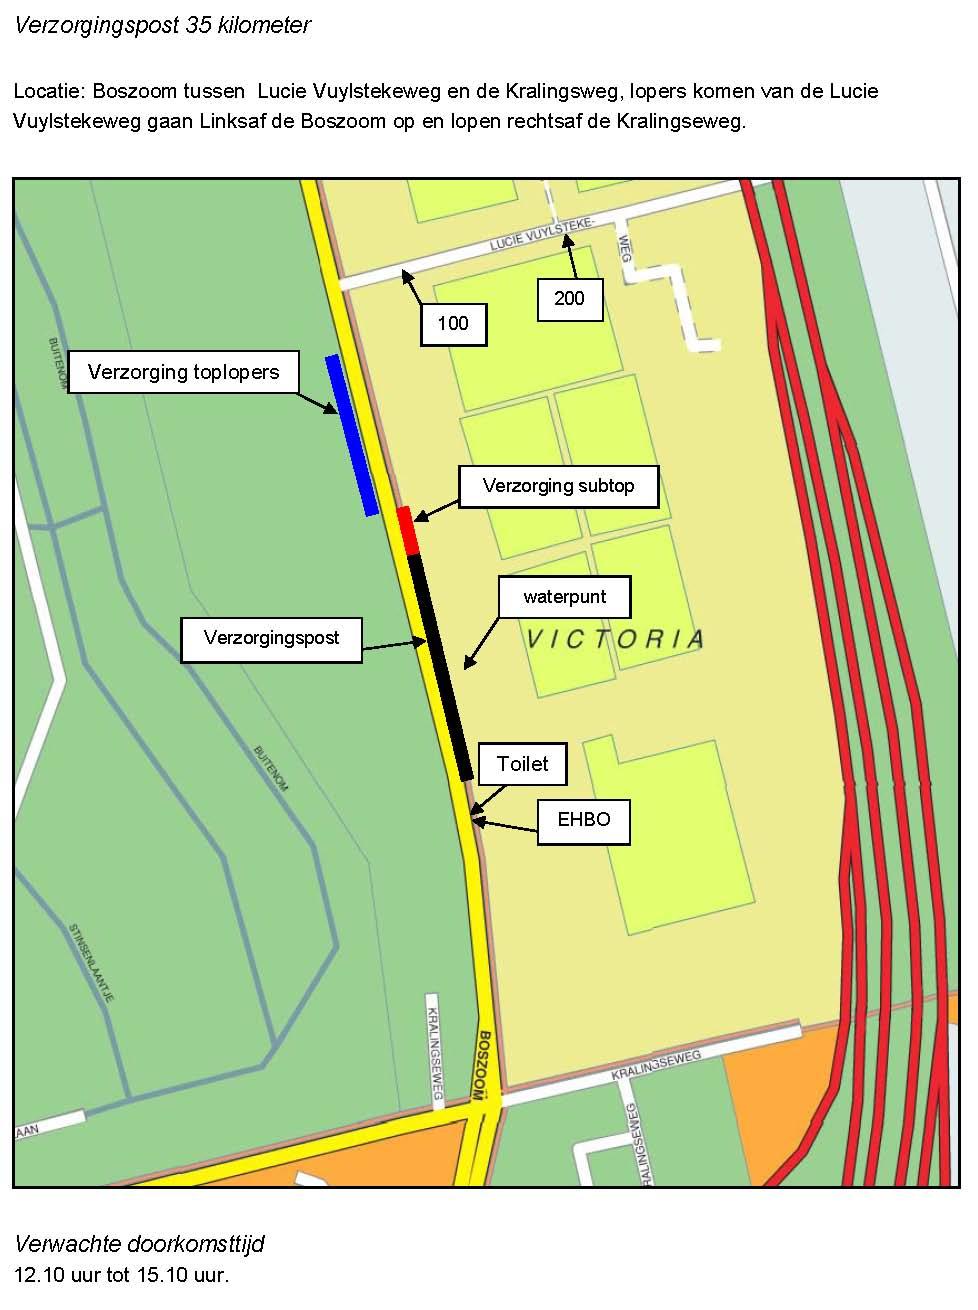 Locatie verzorgingspost marathon van Rotterdam